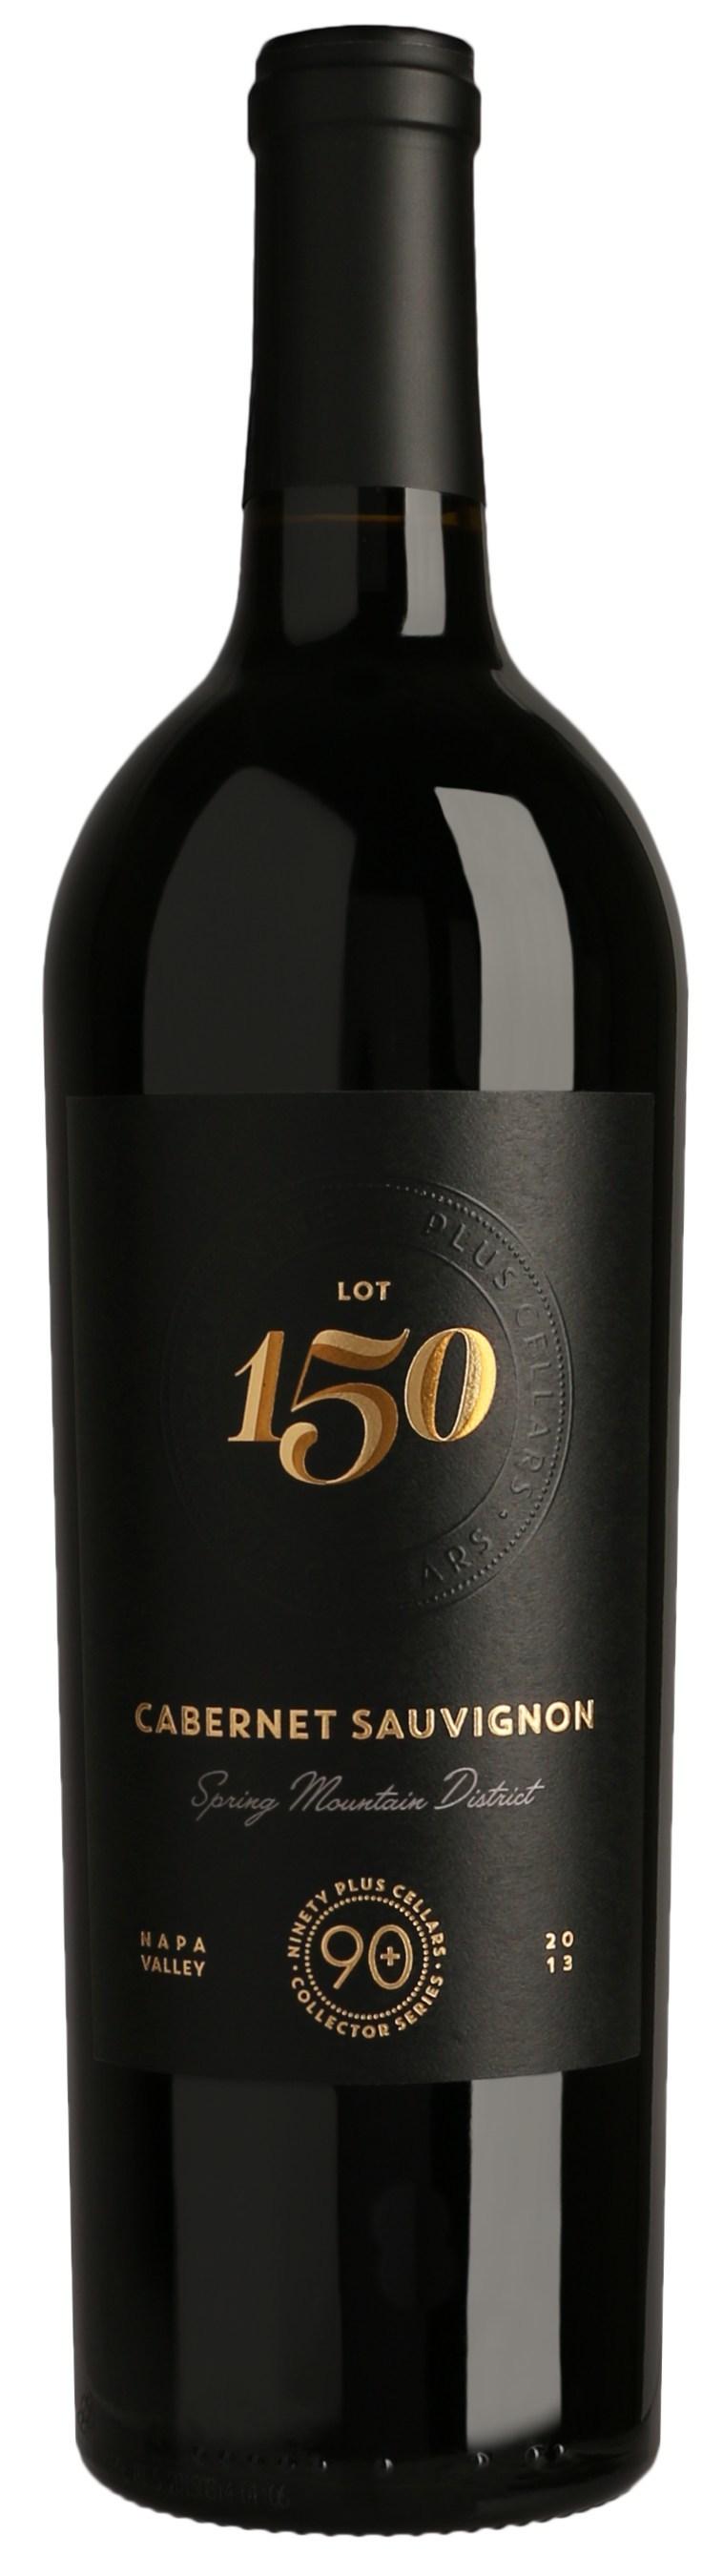 90+ Cellars Lot 150 limited release Cabernet Sauvignon